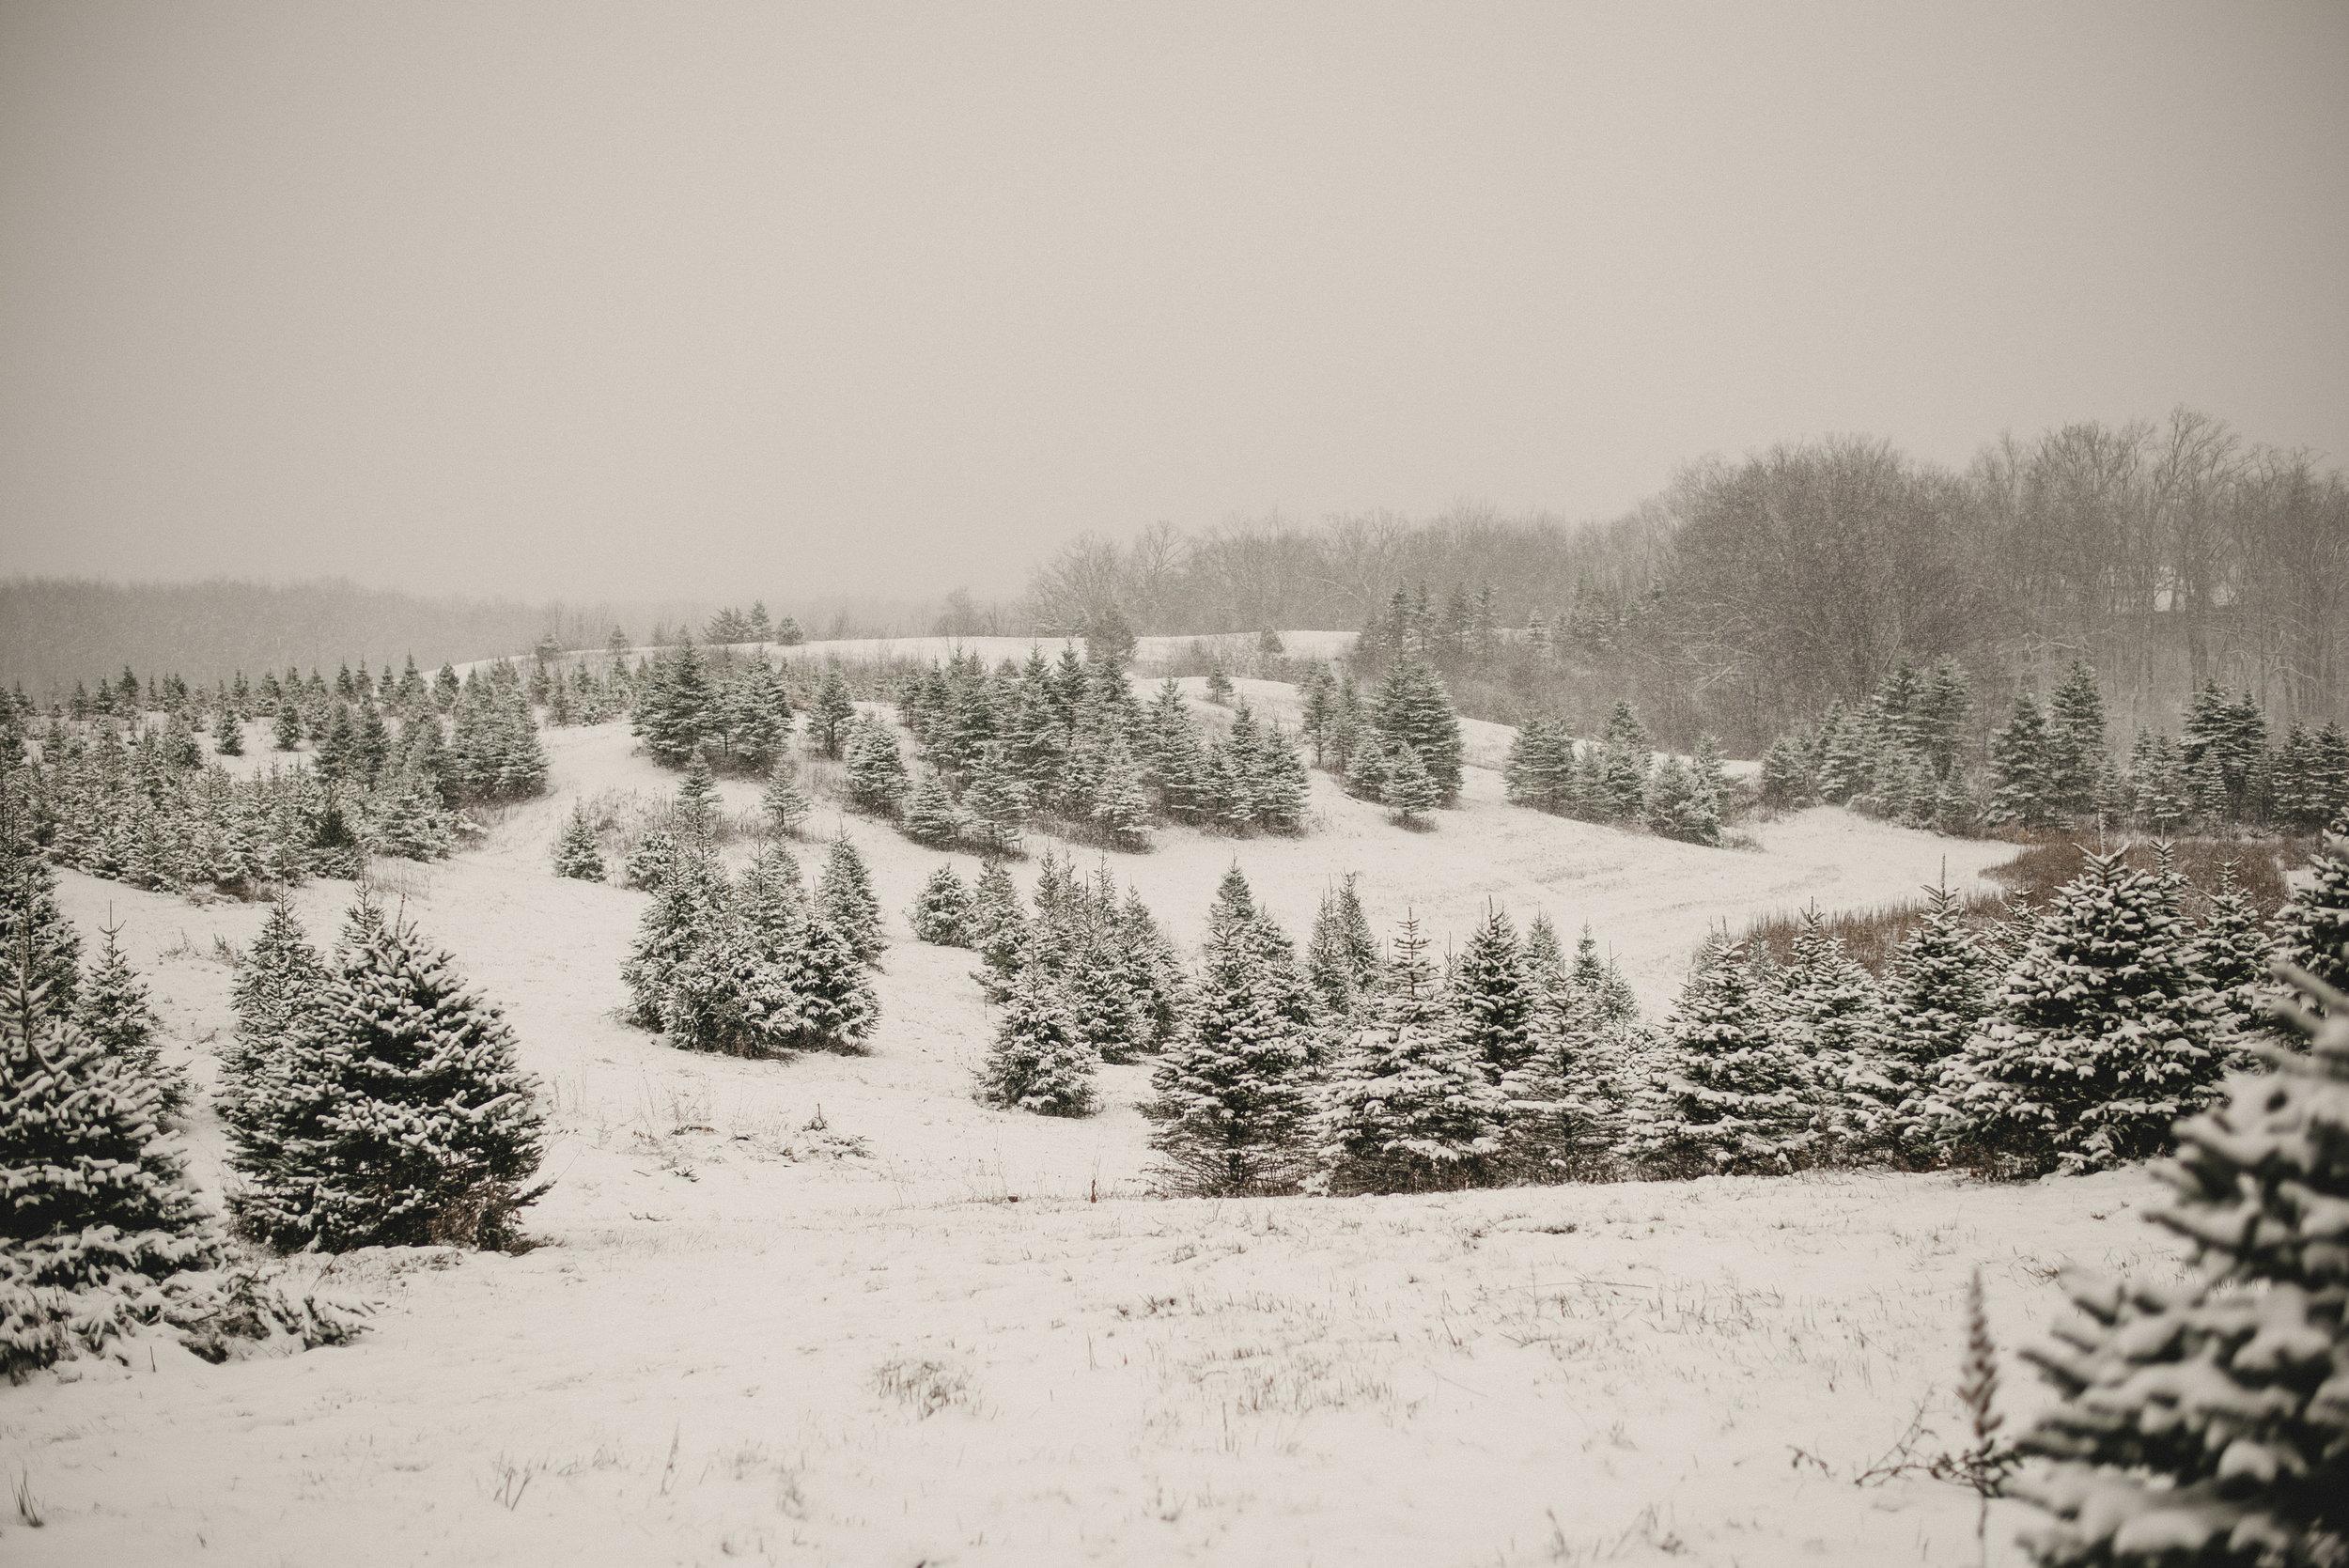 Christmas Tree Farm Family Photo Session Metamora Michigan Winter (3).JPG